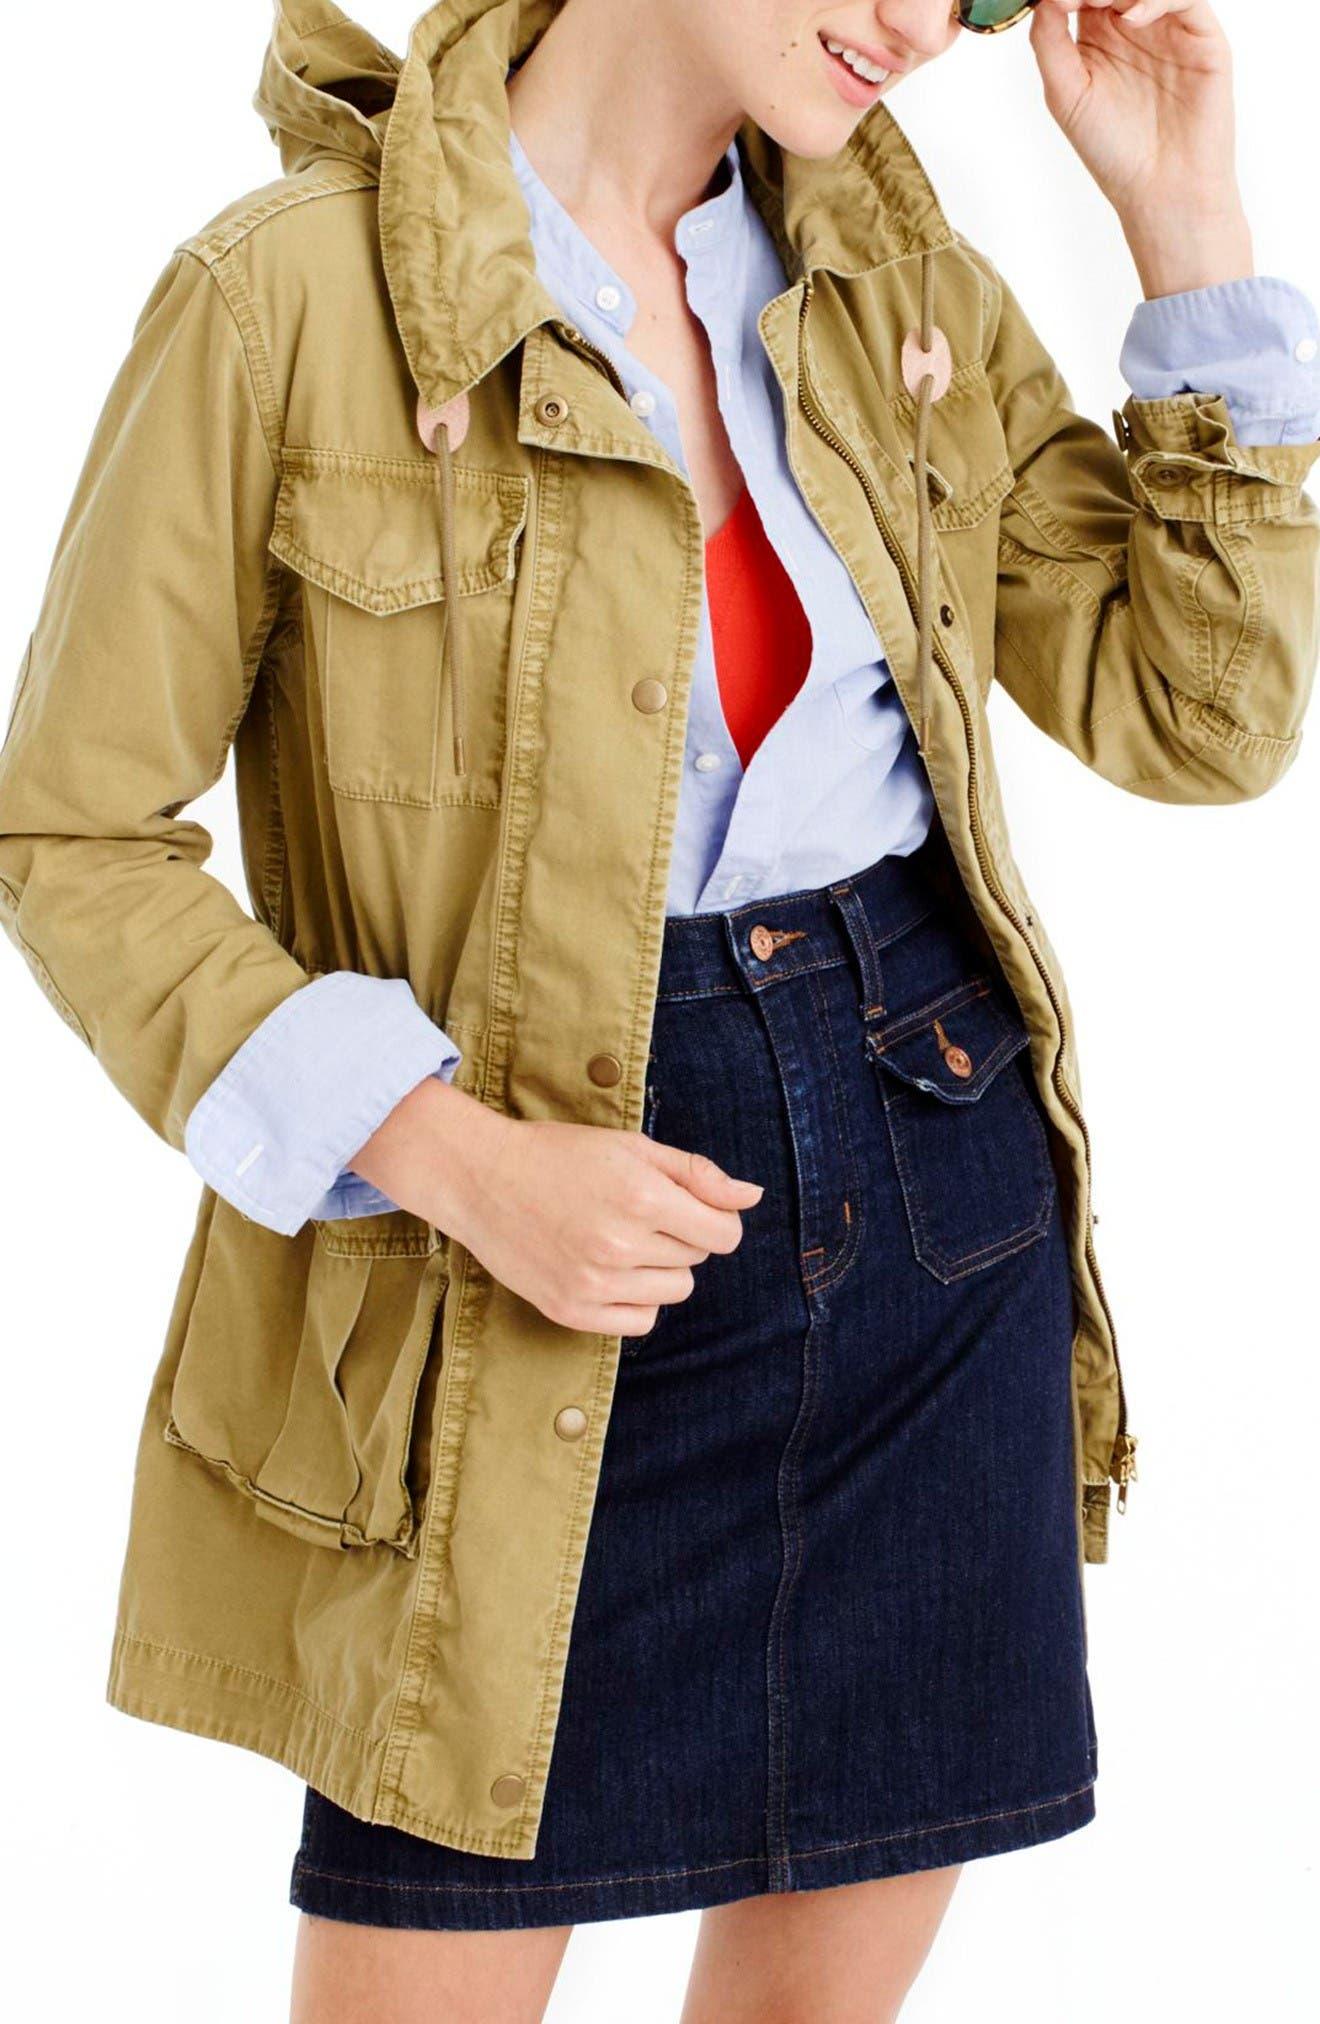 Alternate Image 1 Selected - J.Crew Fatigue Jacket (Regular & Petite)